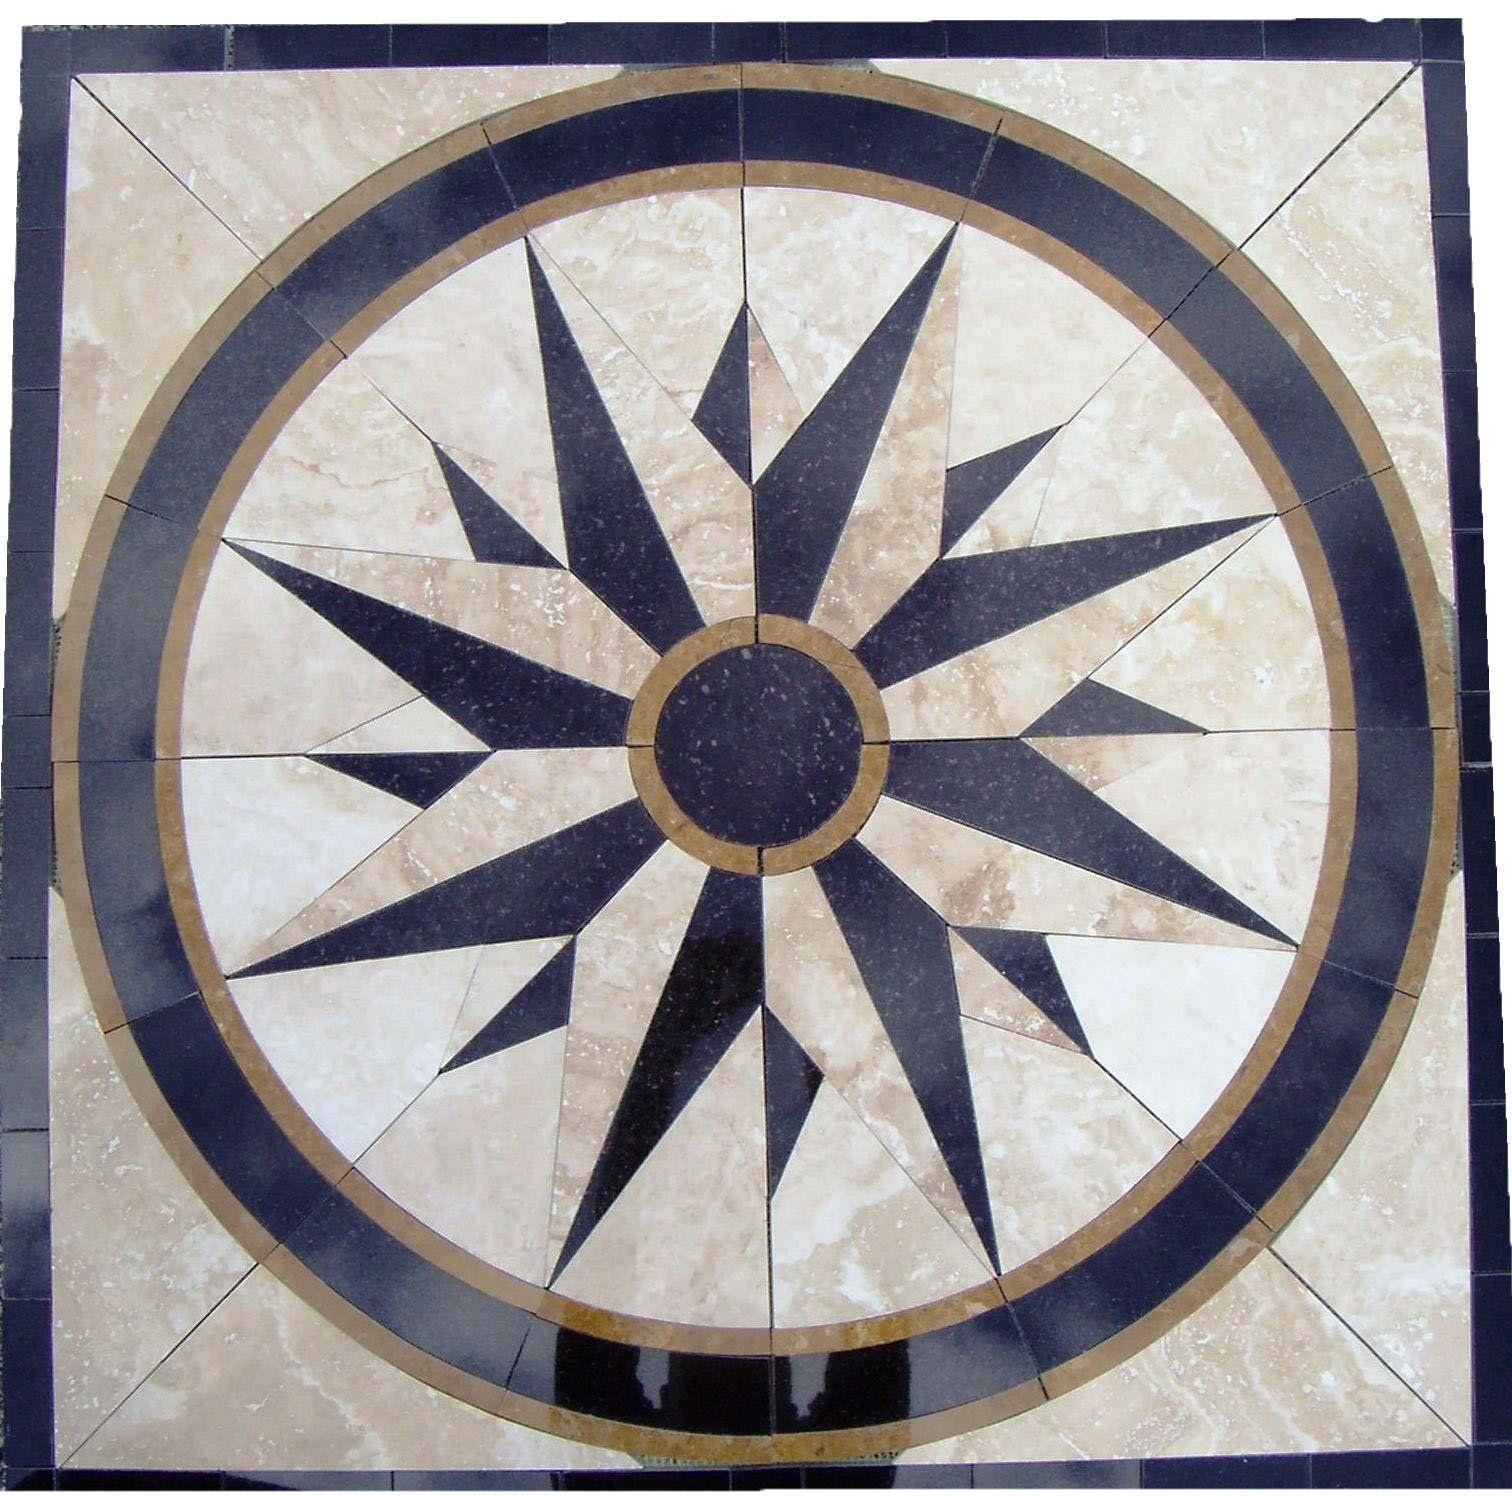 Tile floor medallion marble mosaic north star design 34 tile floor medallion marble mosaic north star design 34 amazon dailygadgetfo Choice Image